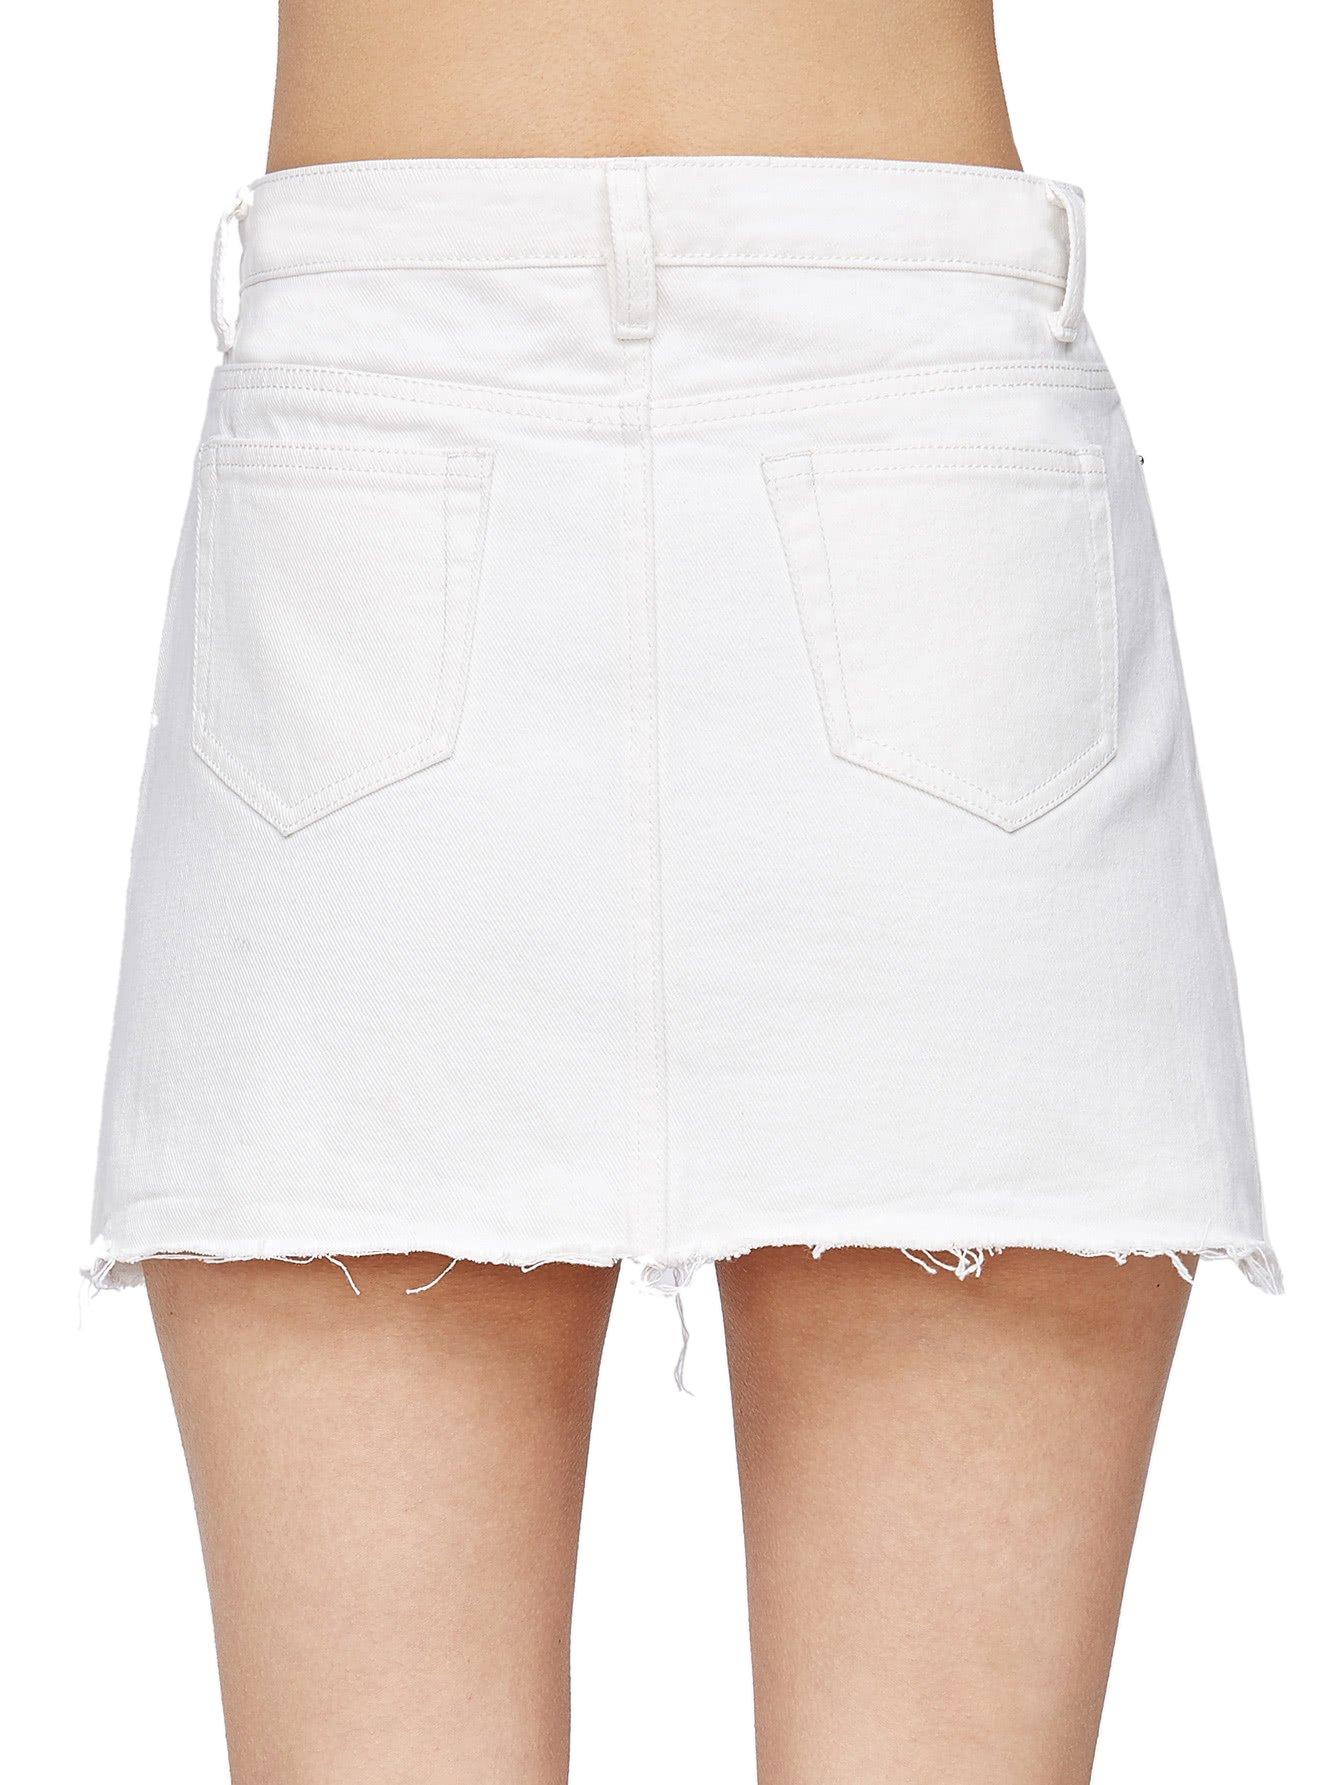 Verdusa Women's Casual Distressed Fray Hem A-Line Denim Short Skirt White S by Verdusa (Image #2)